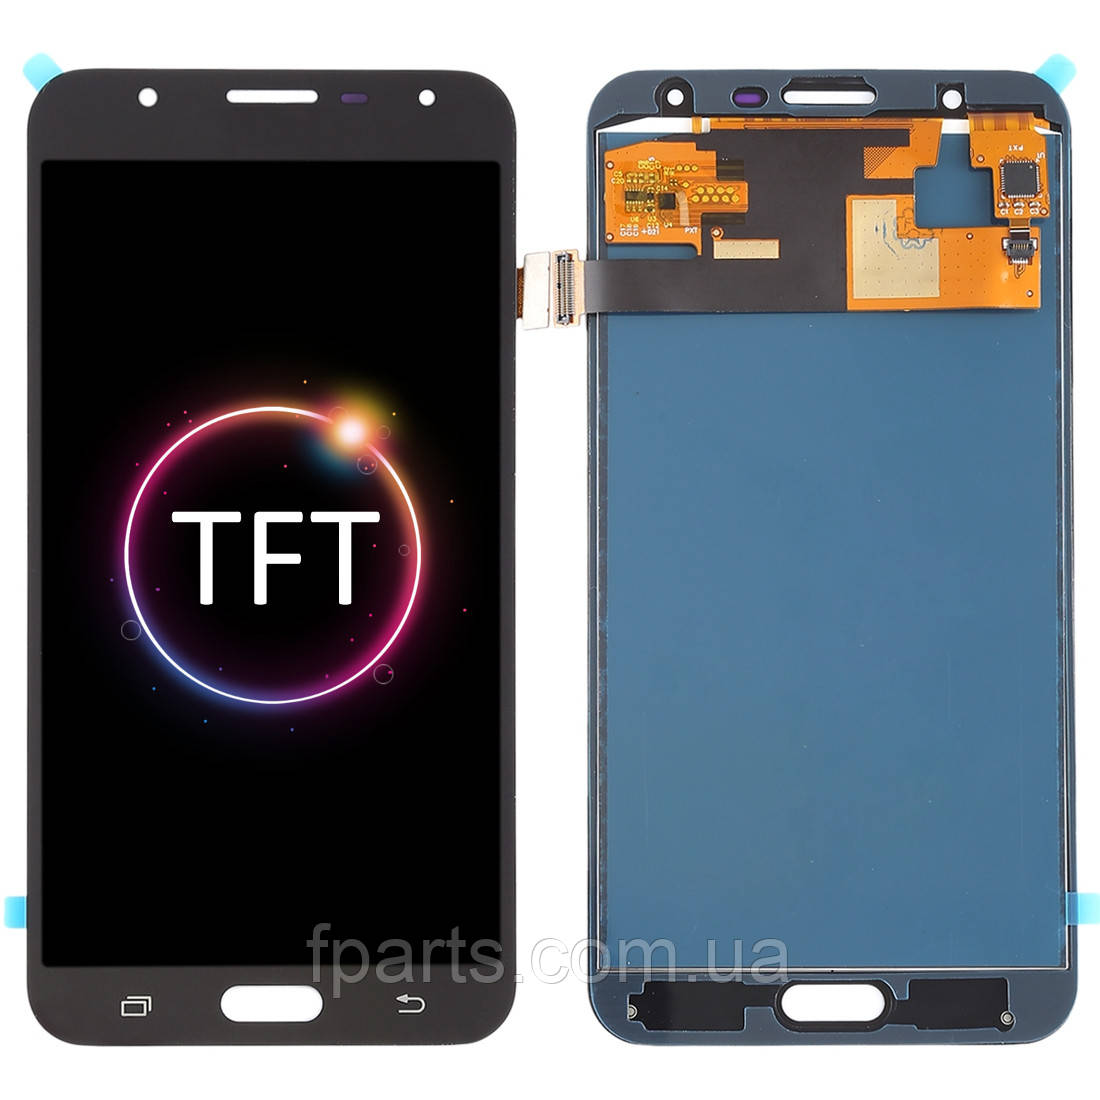 Дисплей для Samsung J701 Galaxy J7 Neo с тачскрином, Black (TFT)